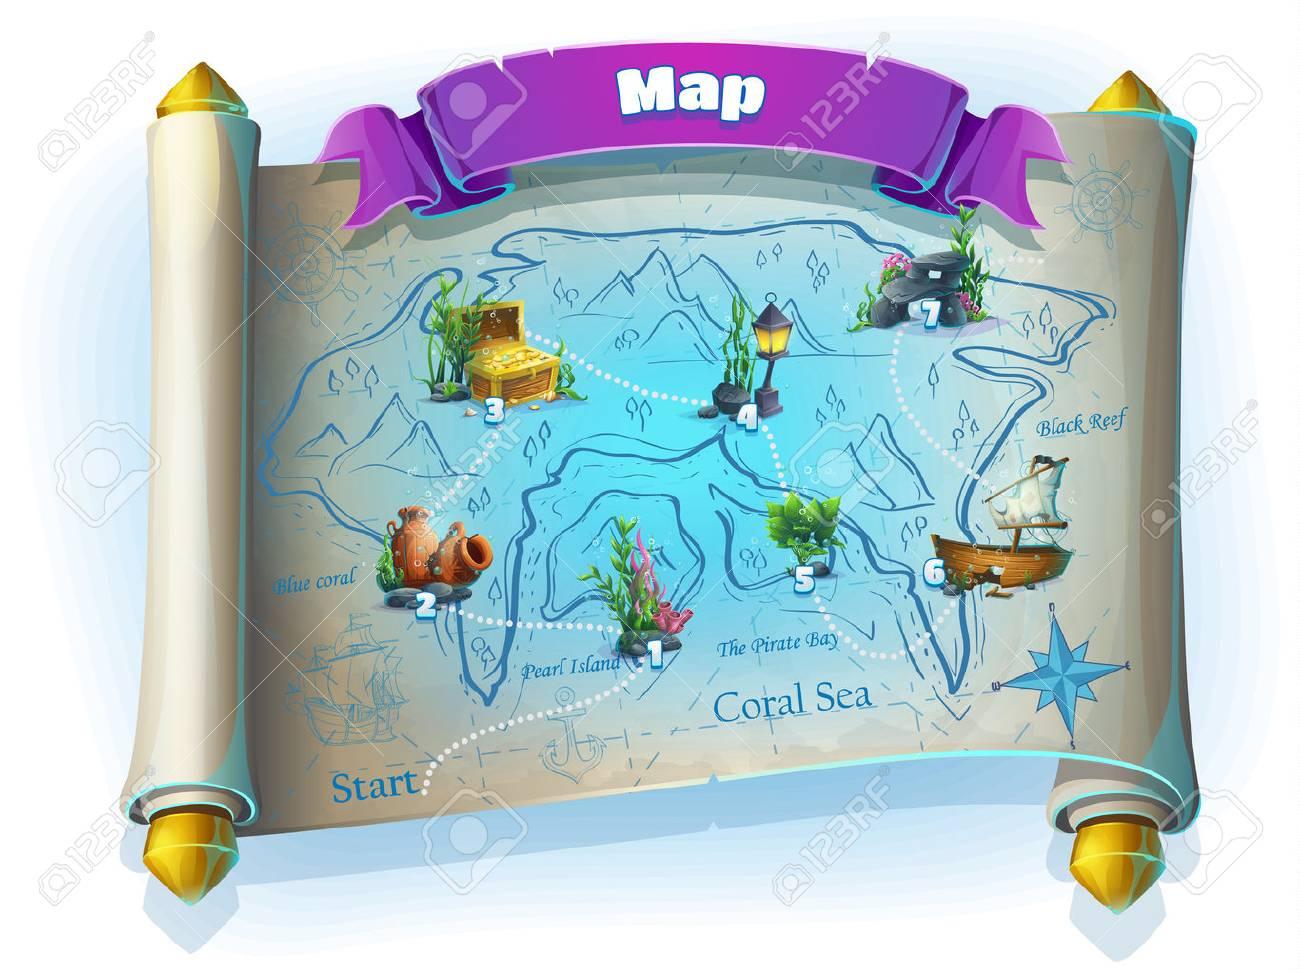 Atlantis ruins playing field - 59197218